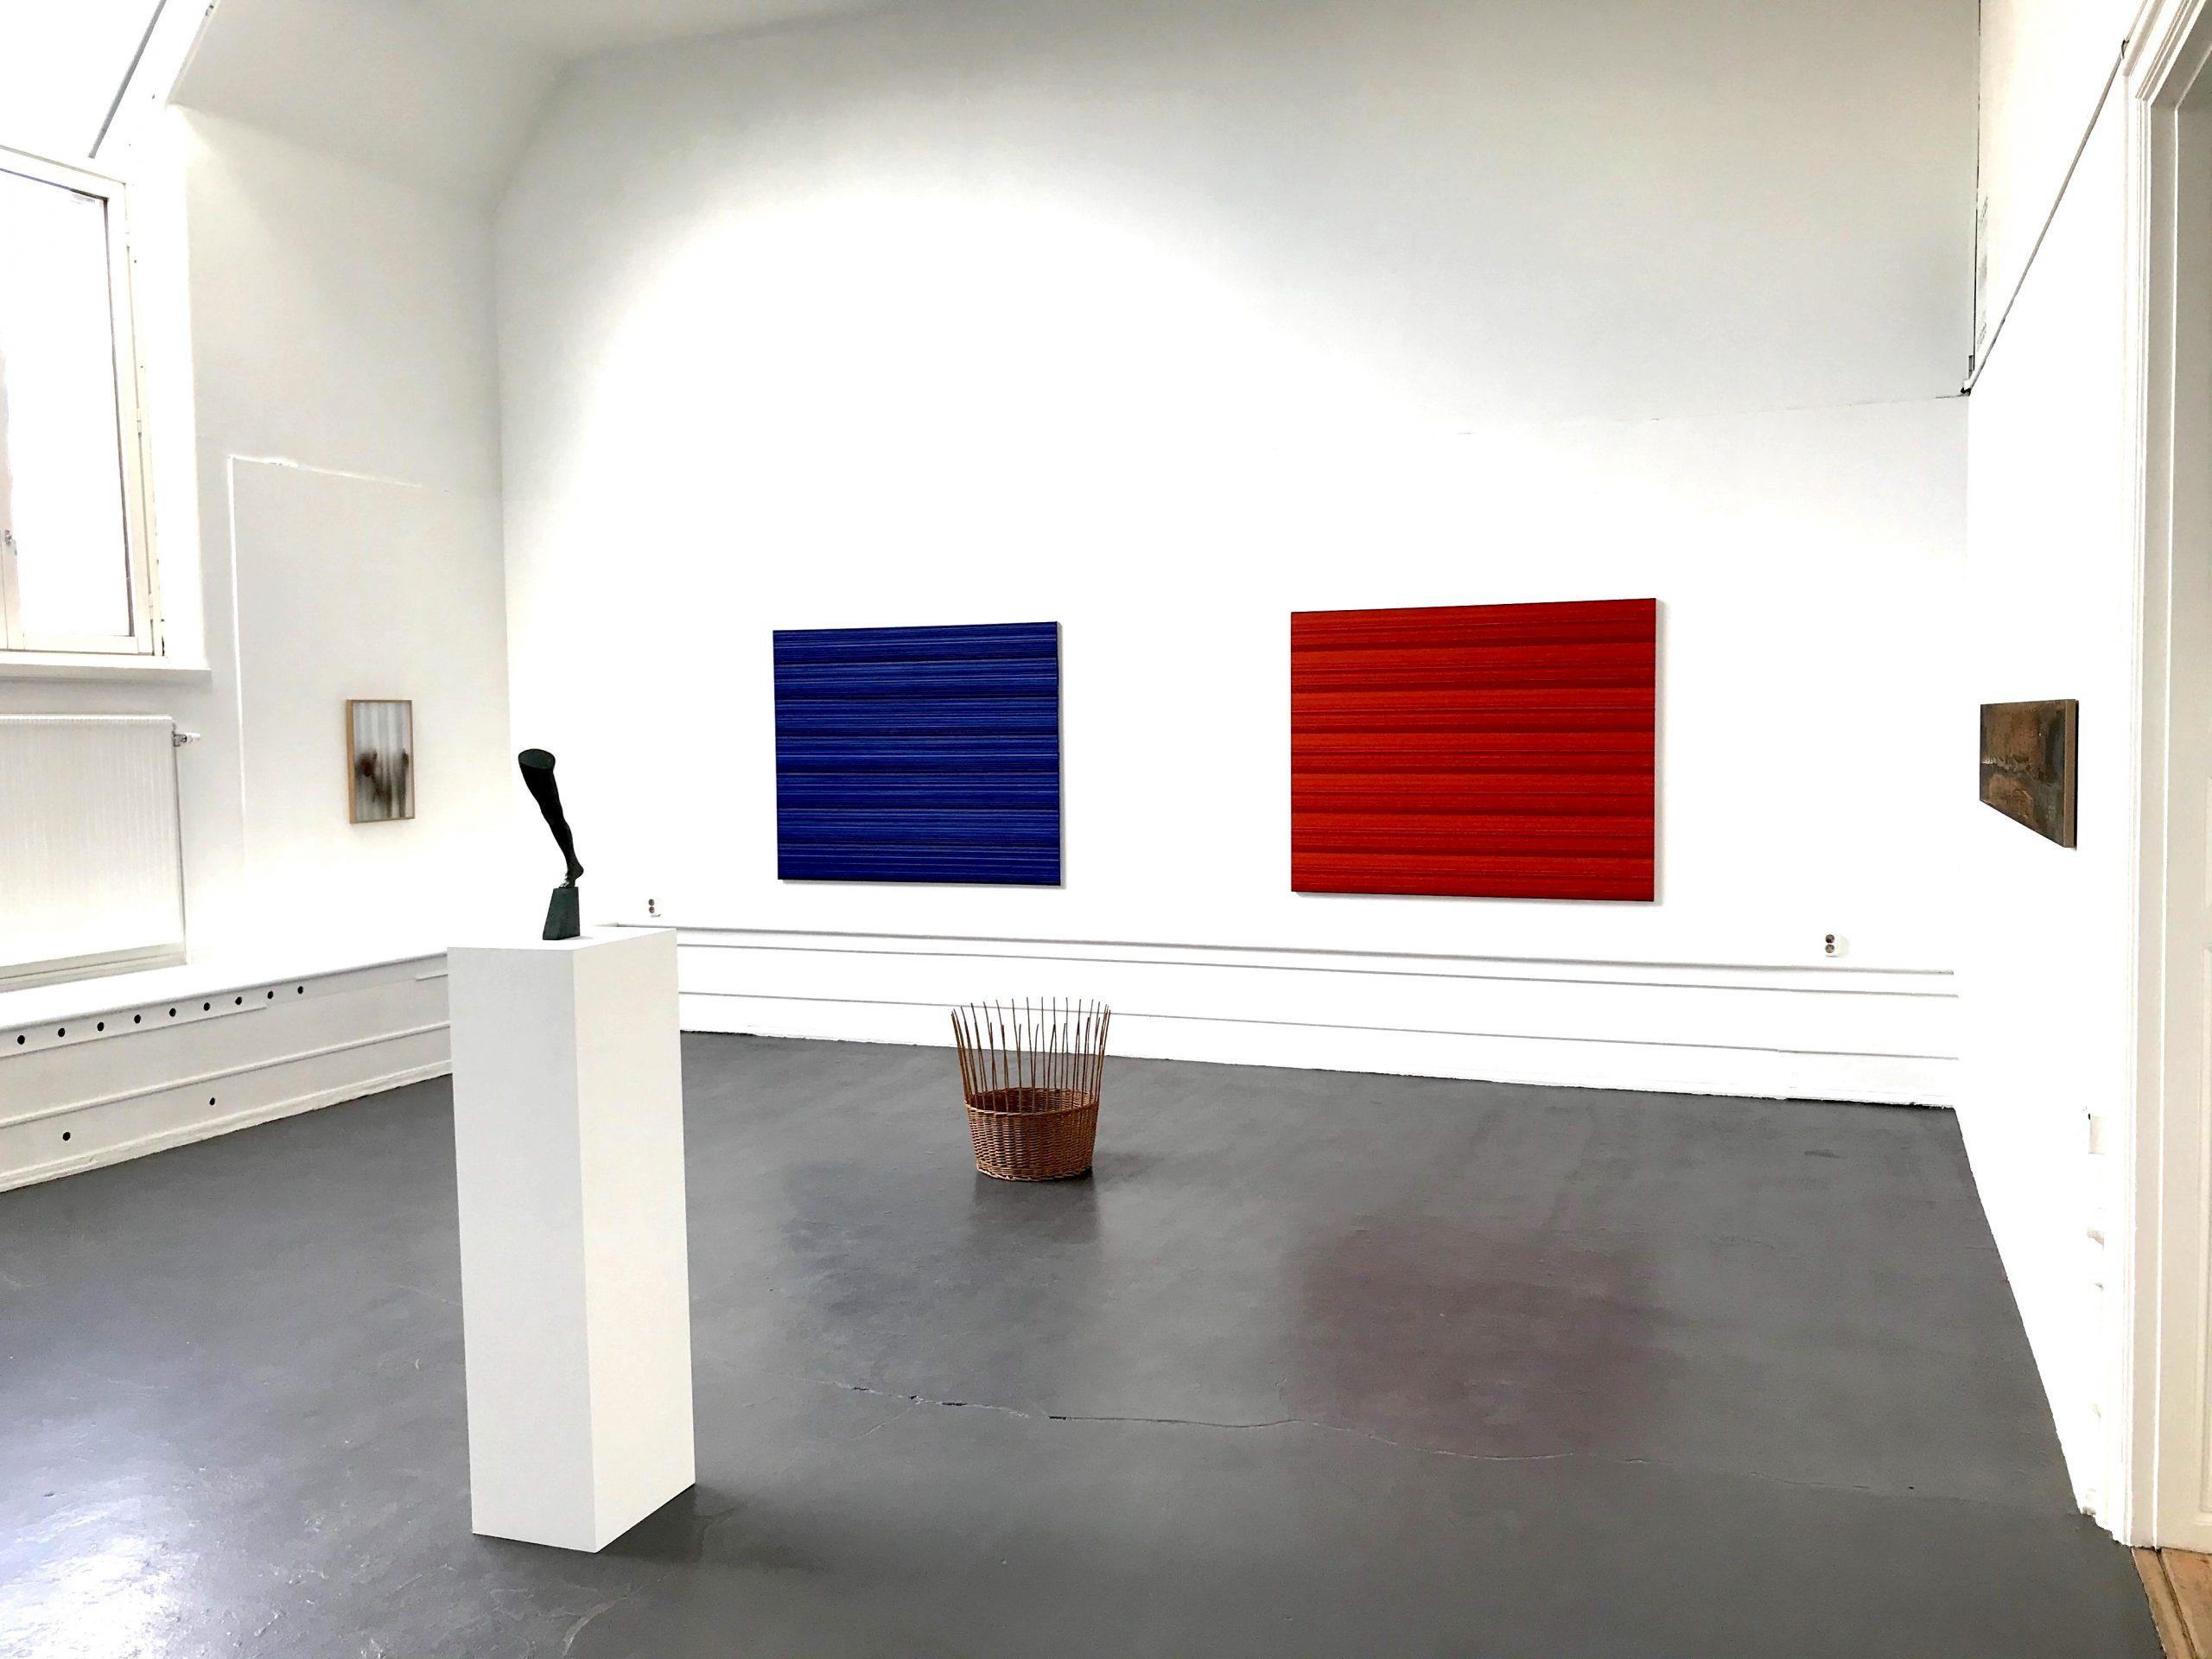 Ande och Materia / Mind and Matter, april 2020. Installation view. Rickard Sollman, Fredrik Wretman, Jakob Solgren